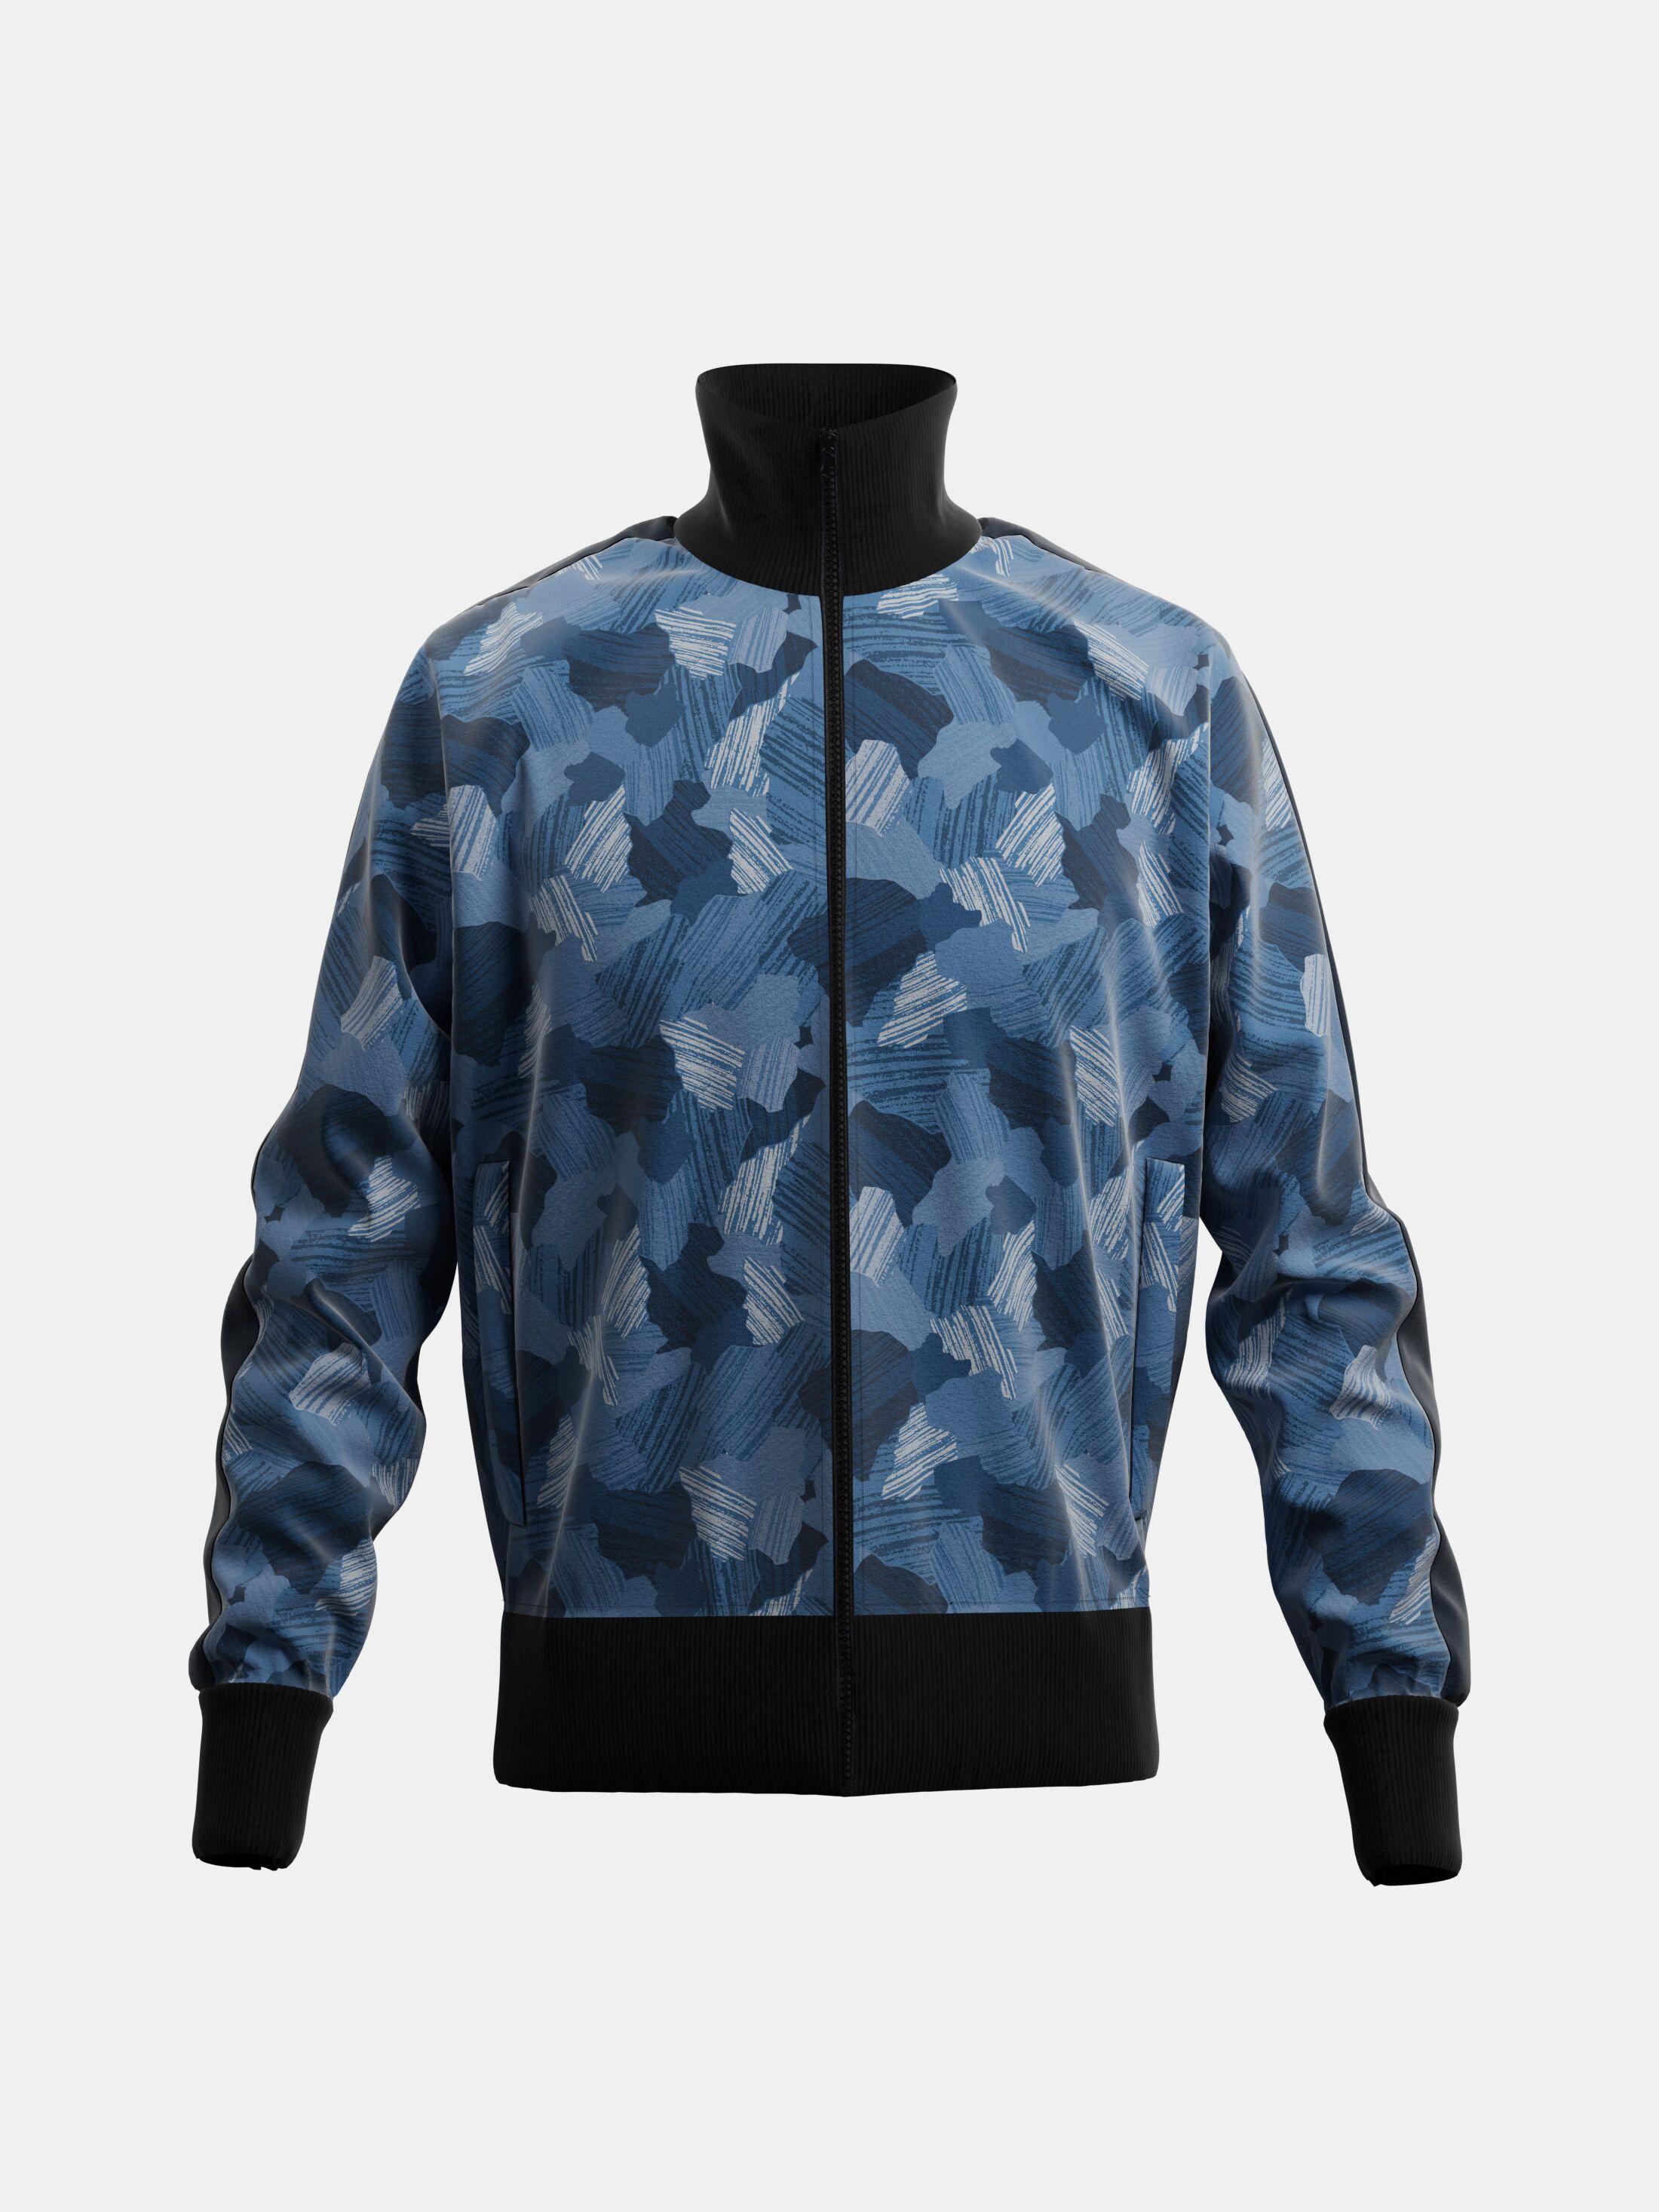 Custom Jogging Jacket & Pants design